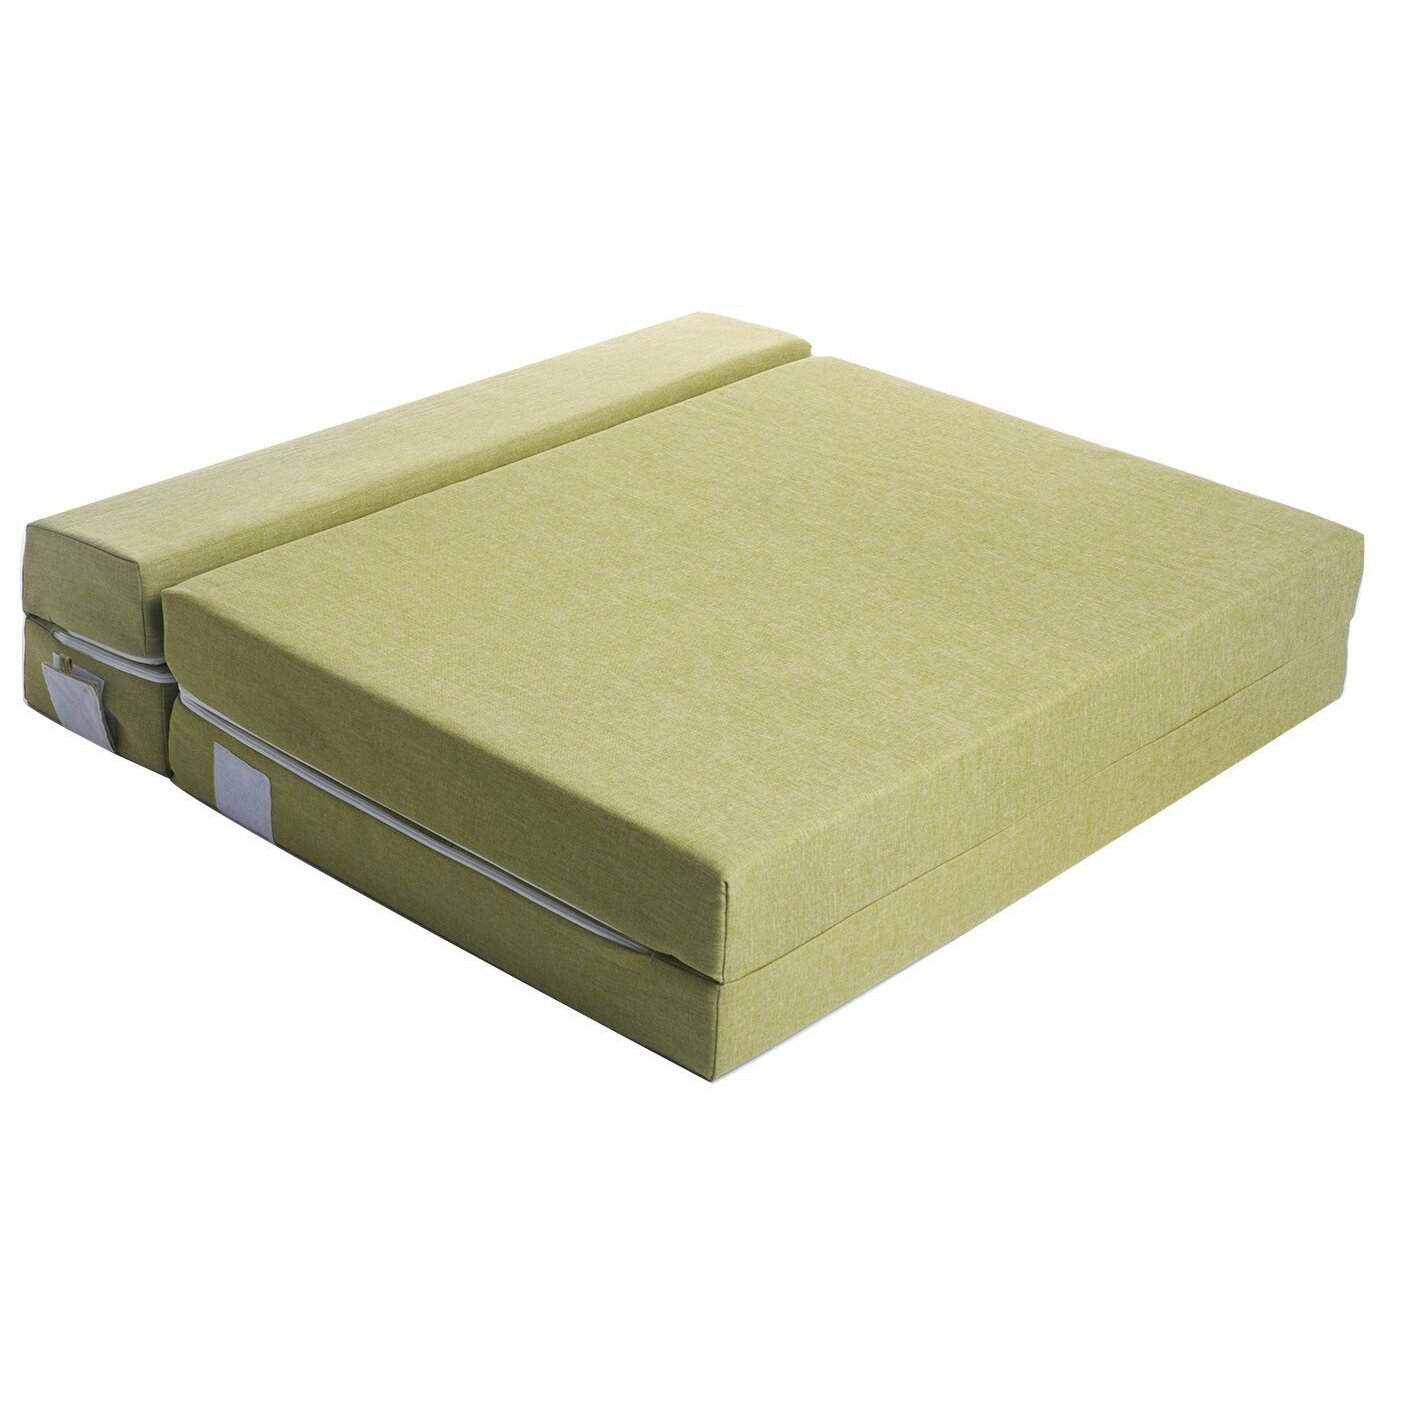 "Merax 4"" Gel Memory Foam Mattress"